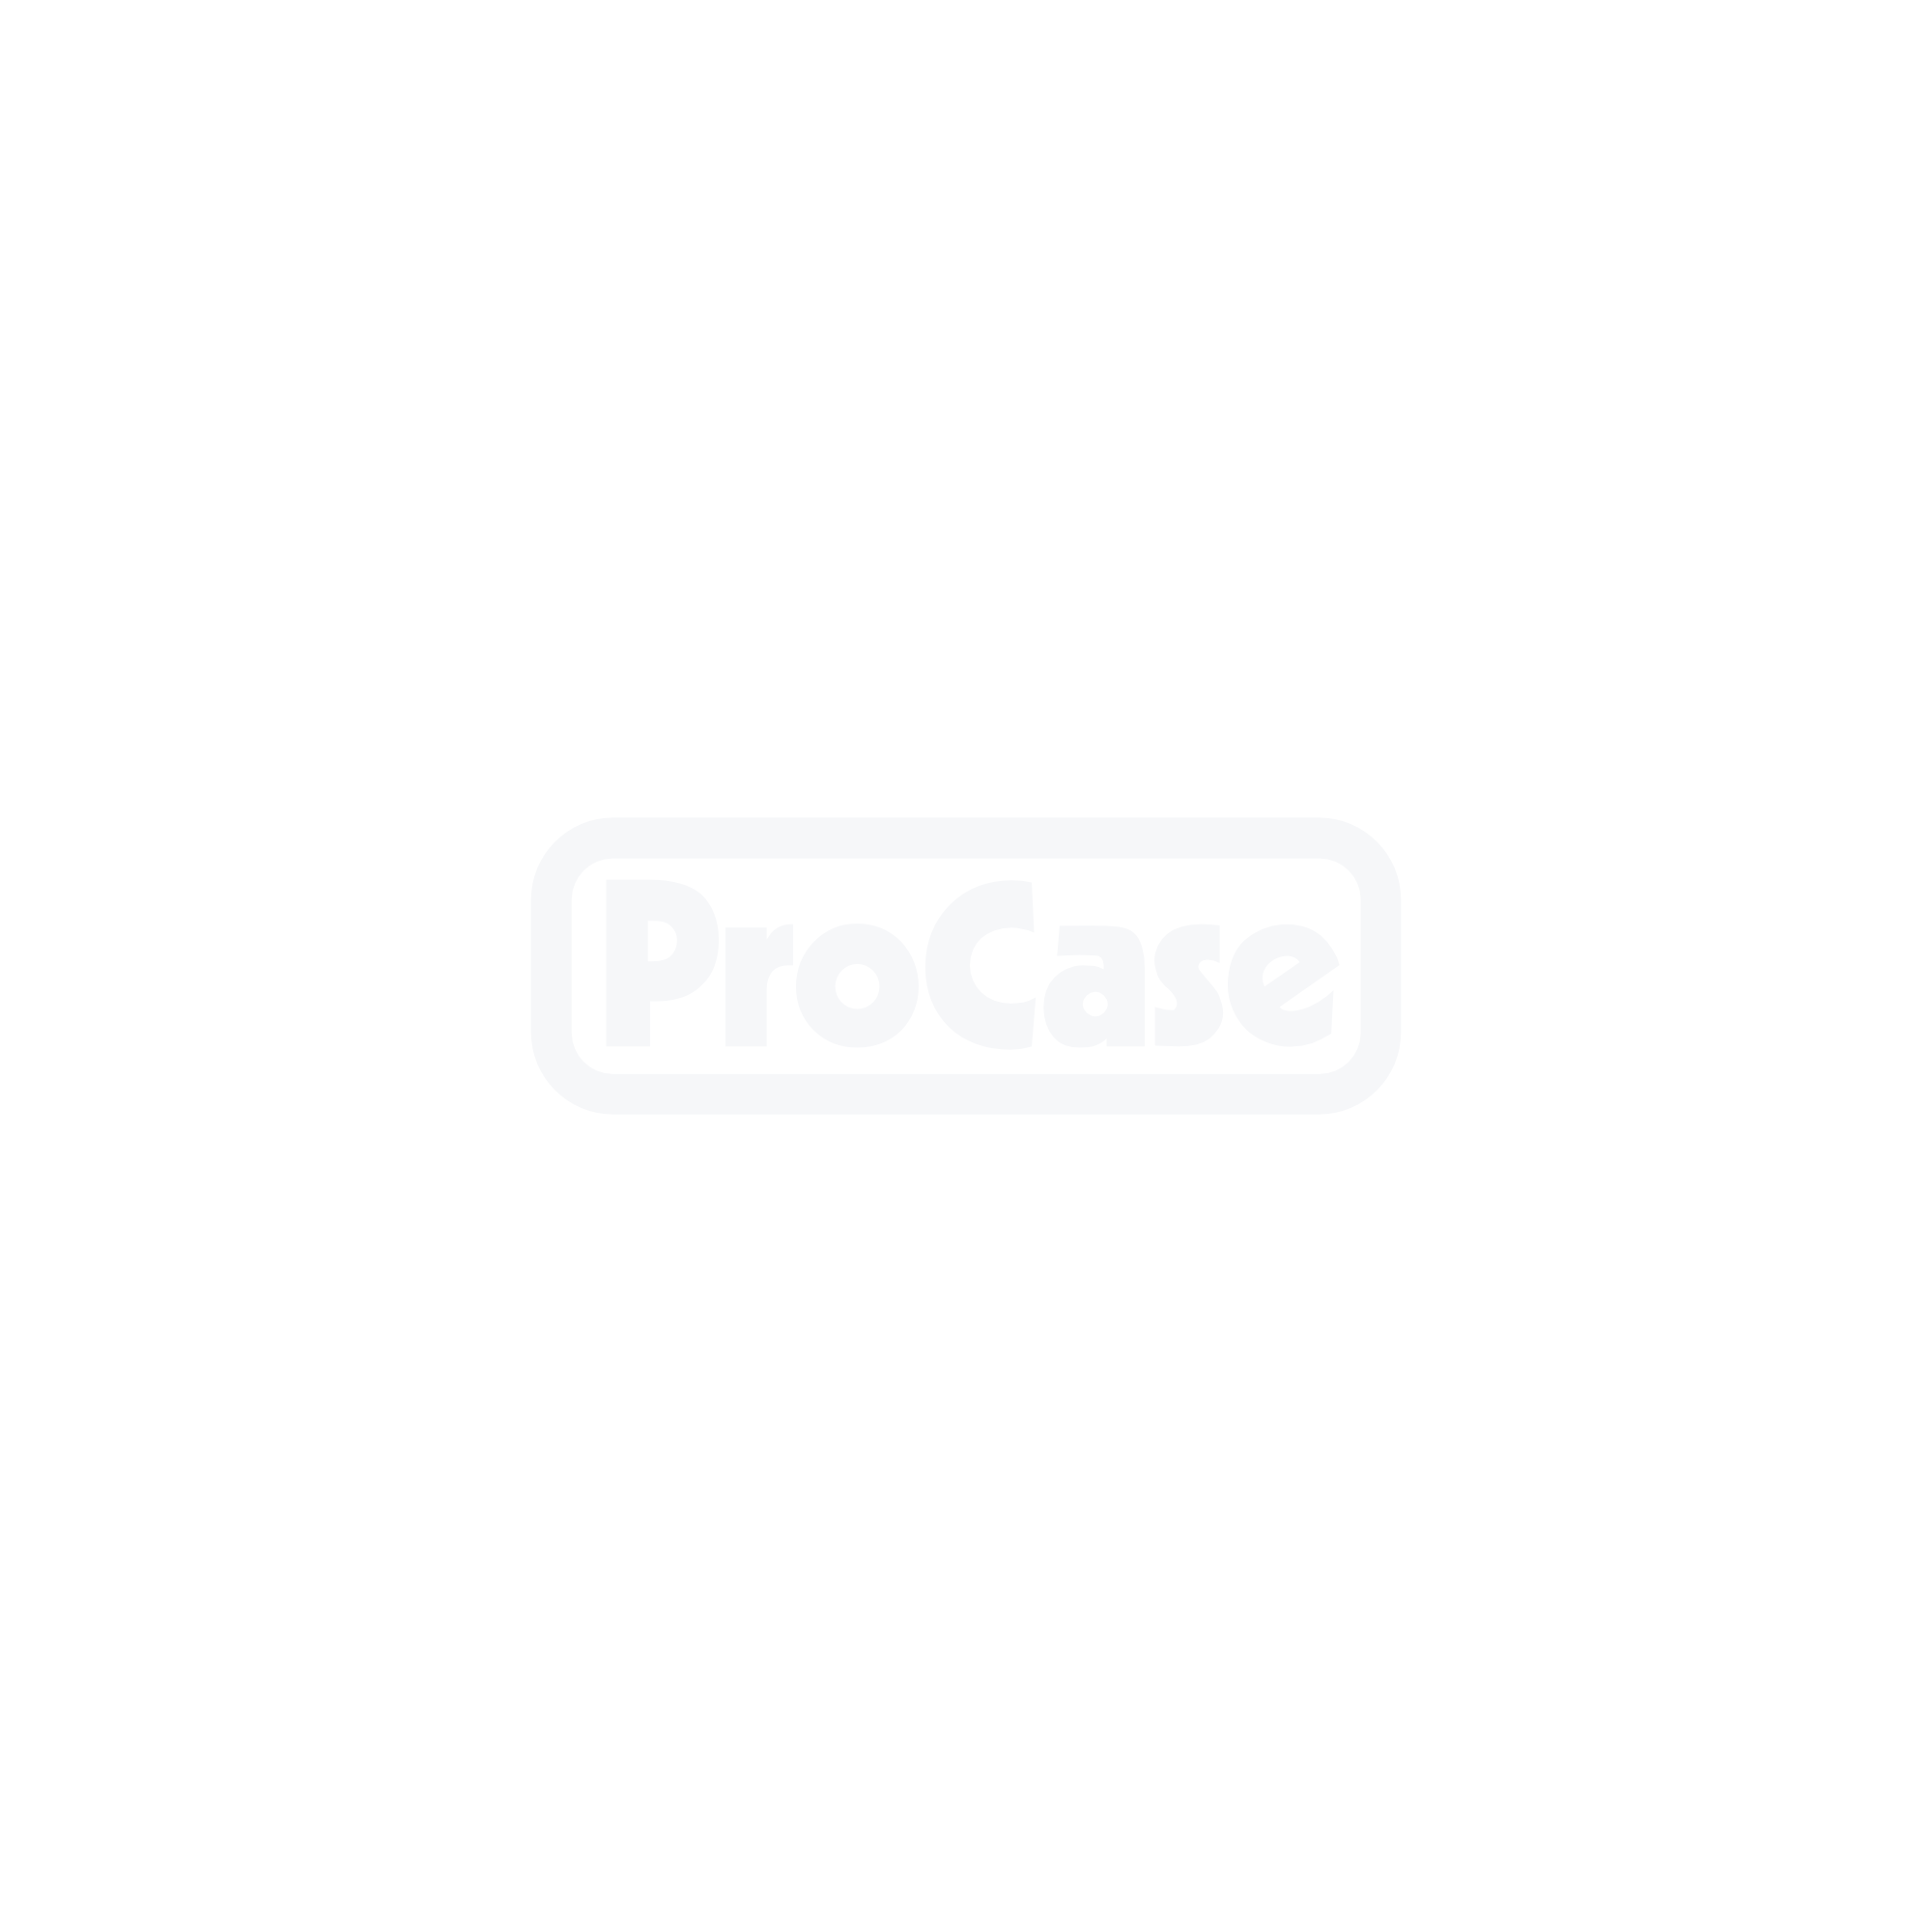 Transporkoffer für Sanyo PLC-XU78 3